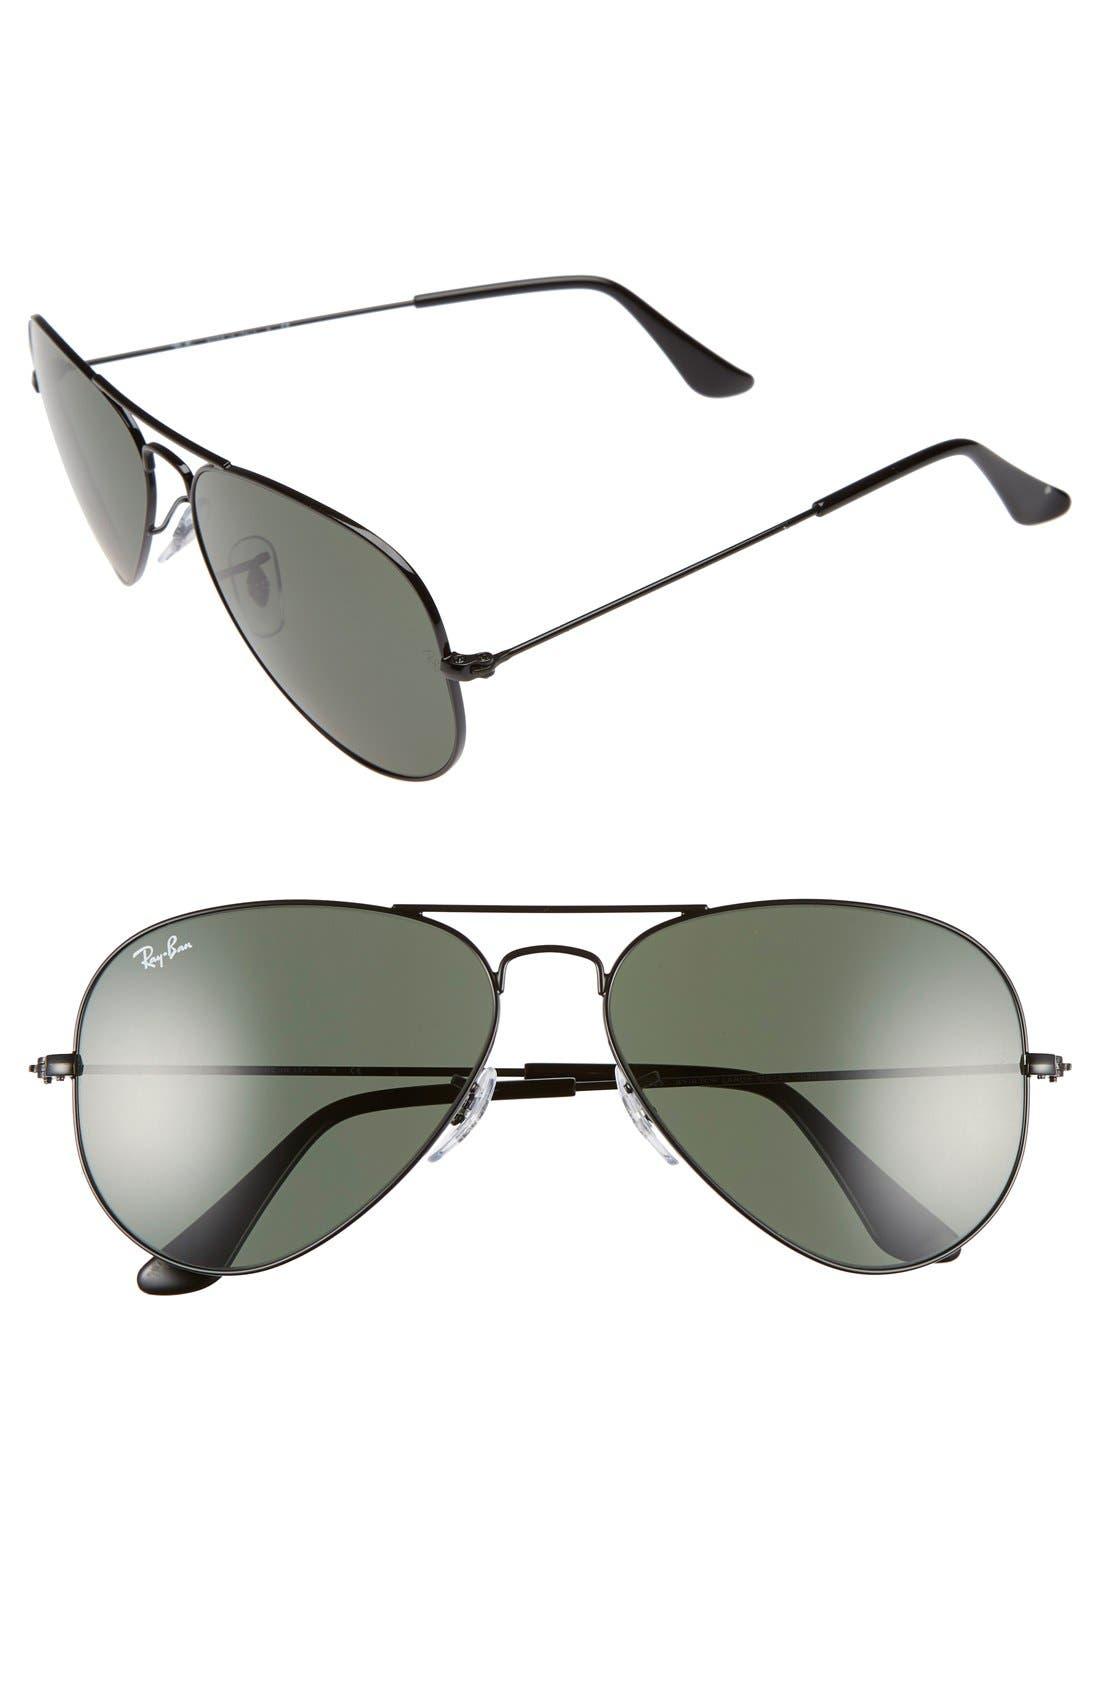 Standard Original 58mm Aviator Sunglasses,                         Main,                         color, Black